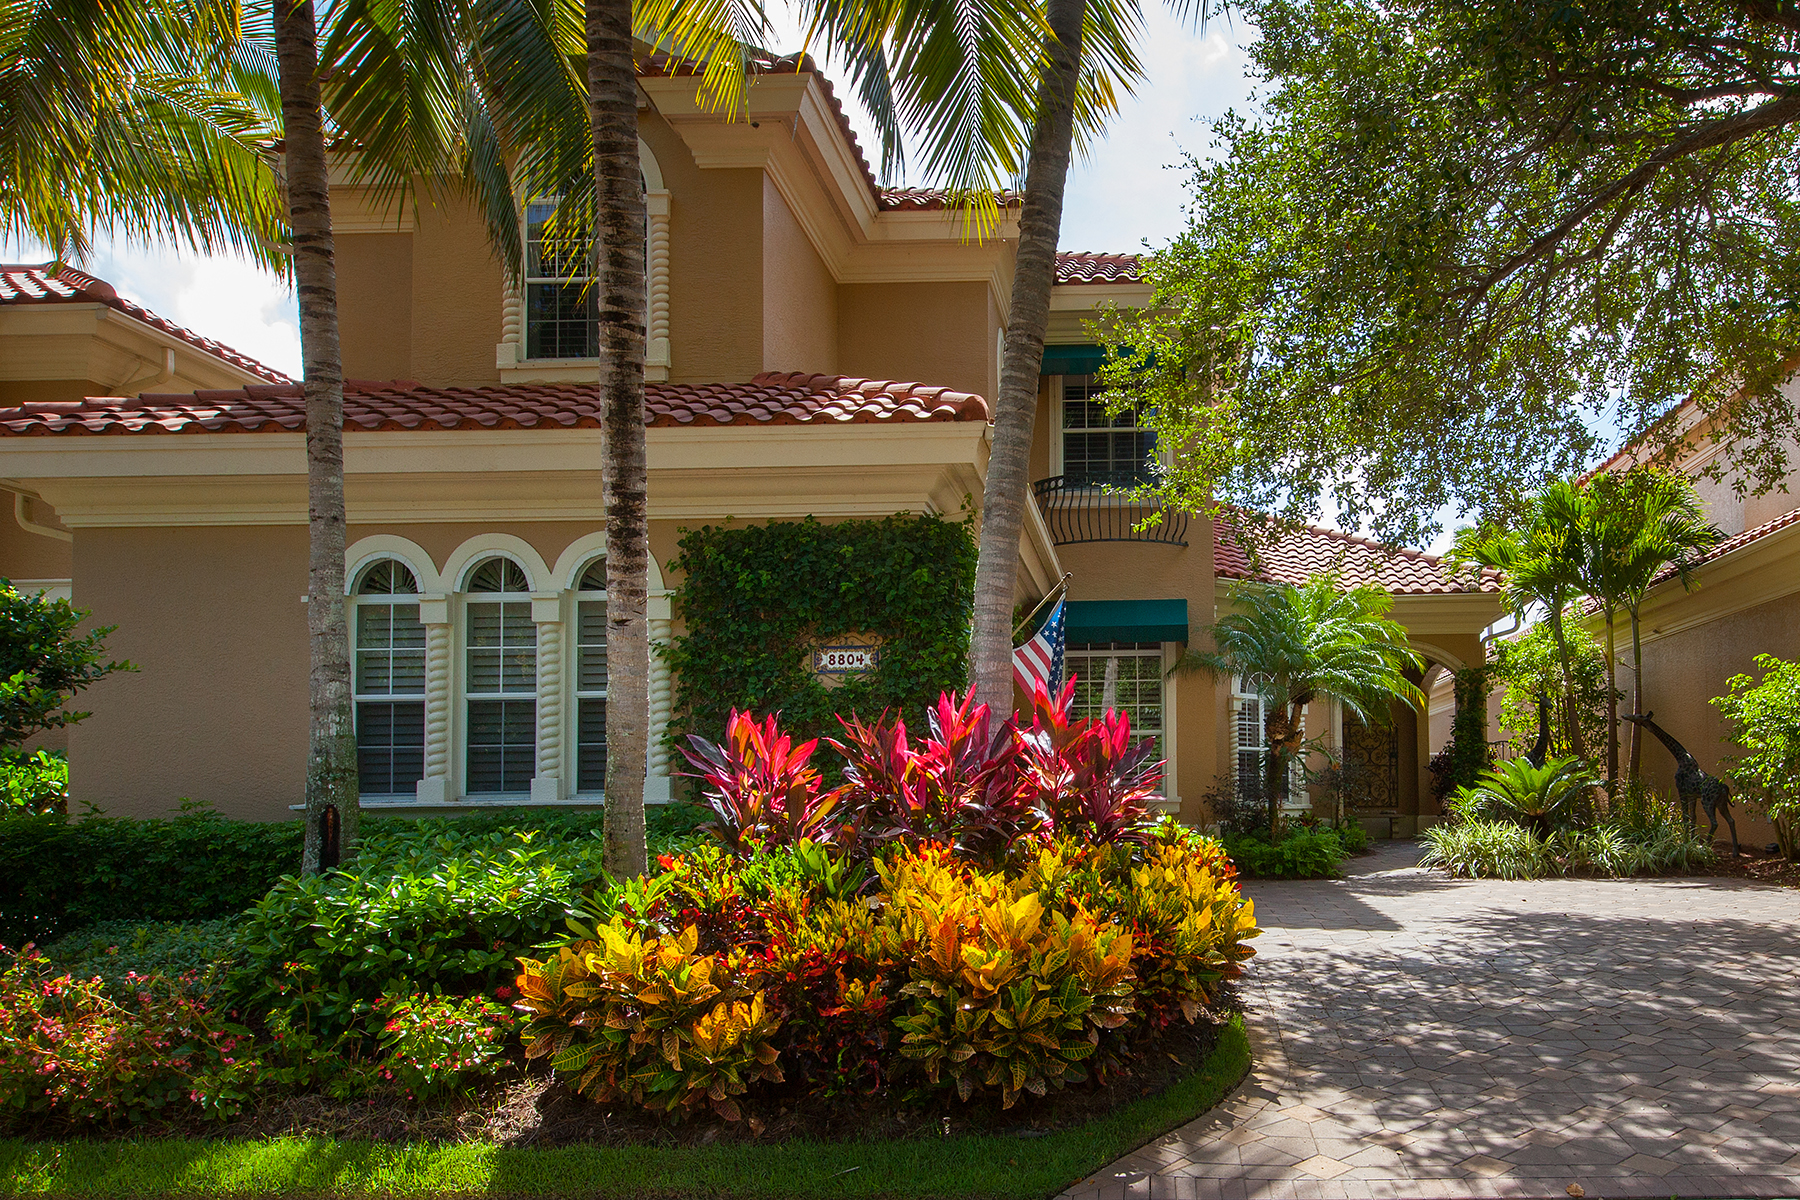 Single Family Home for Sale at PELICAN BAY - VILLA LA PALMA AT BAY COLONY 8804 La Palma Ln Naples, Florida 34108 United States